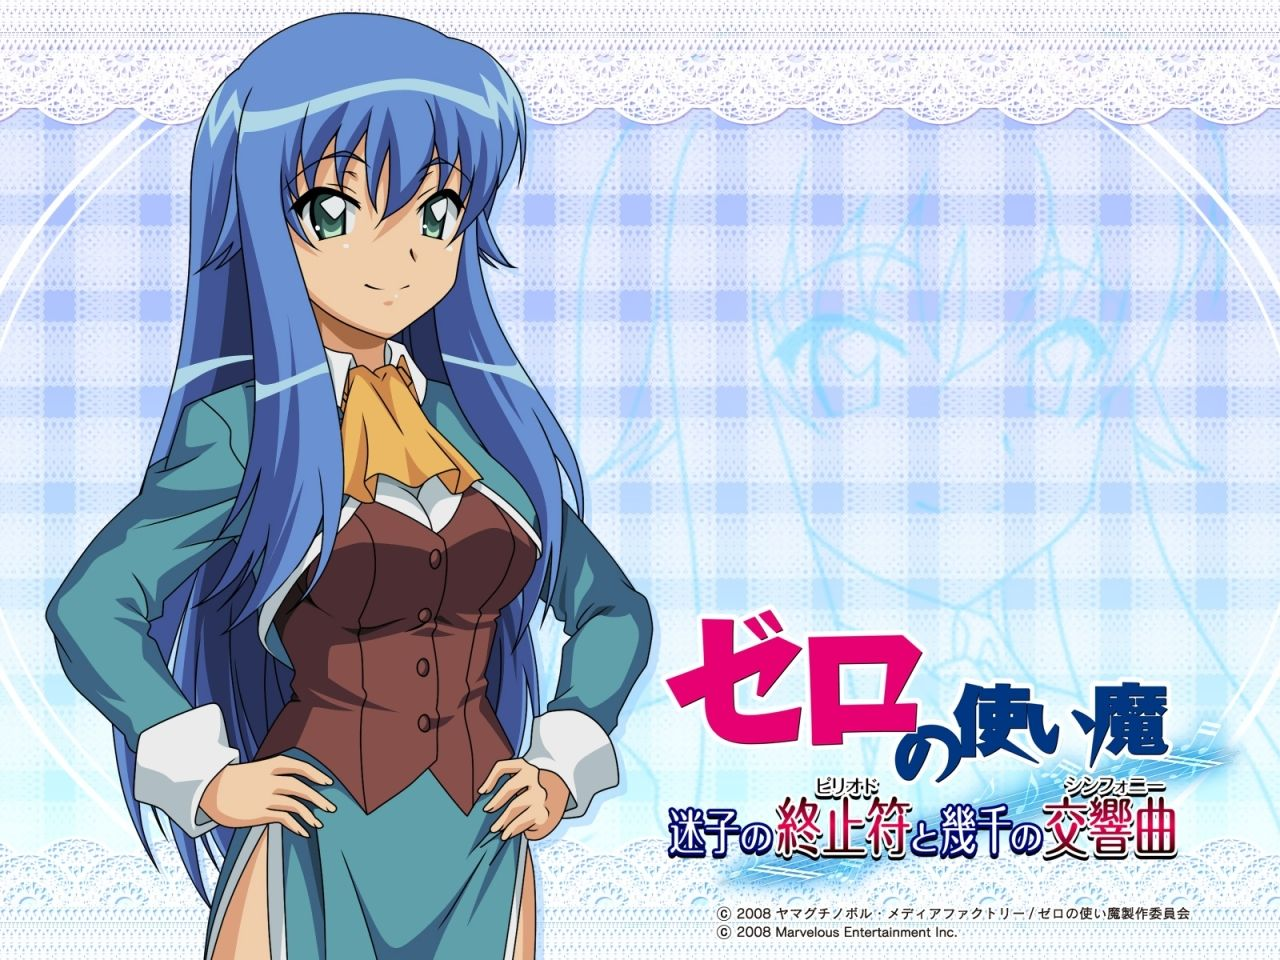 zeroNoTsukaimaSaison3_wallpaper_5855.jpg